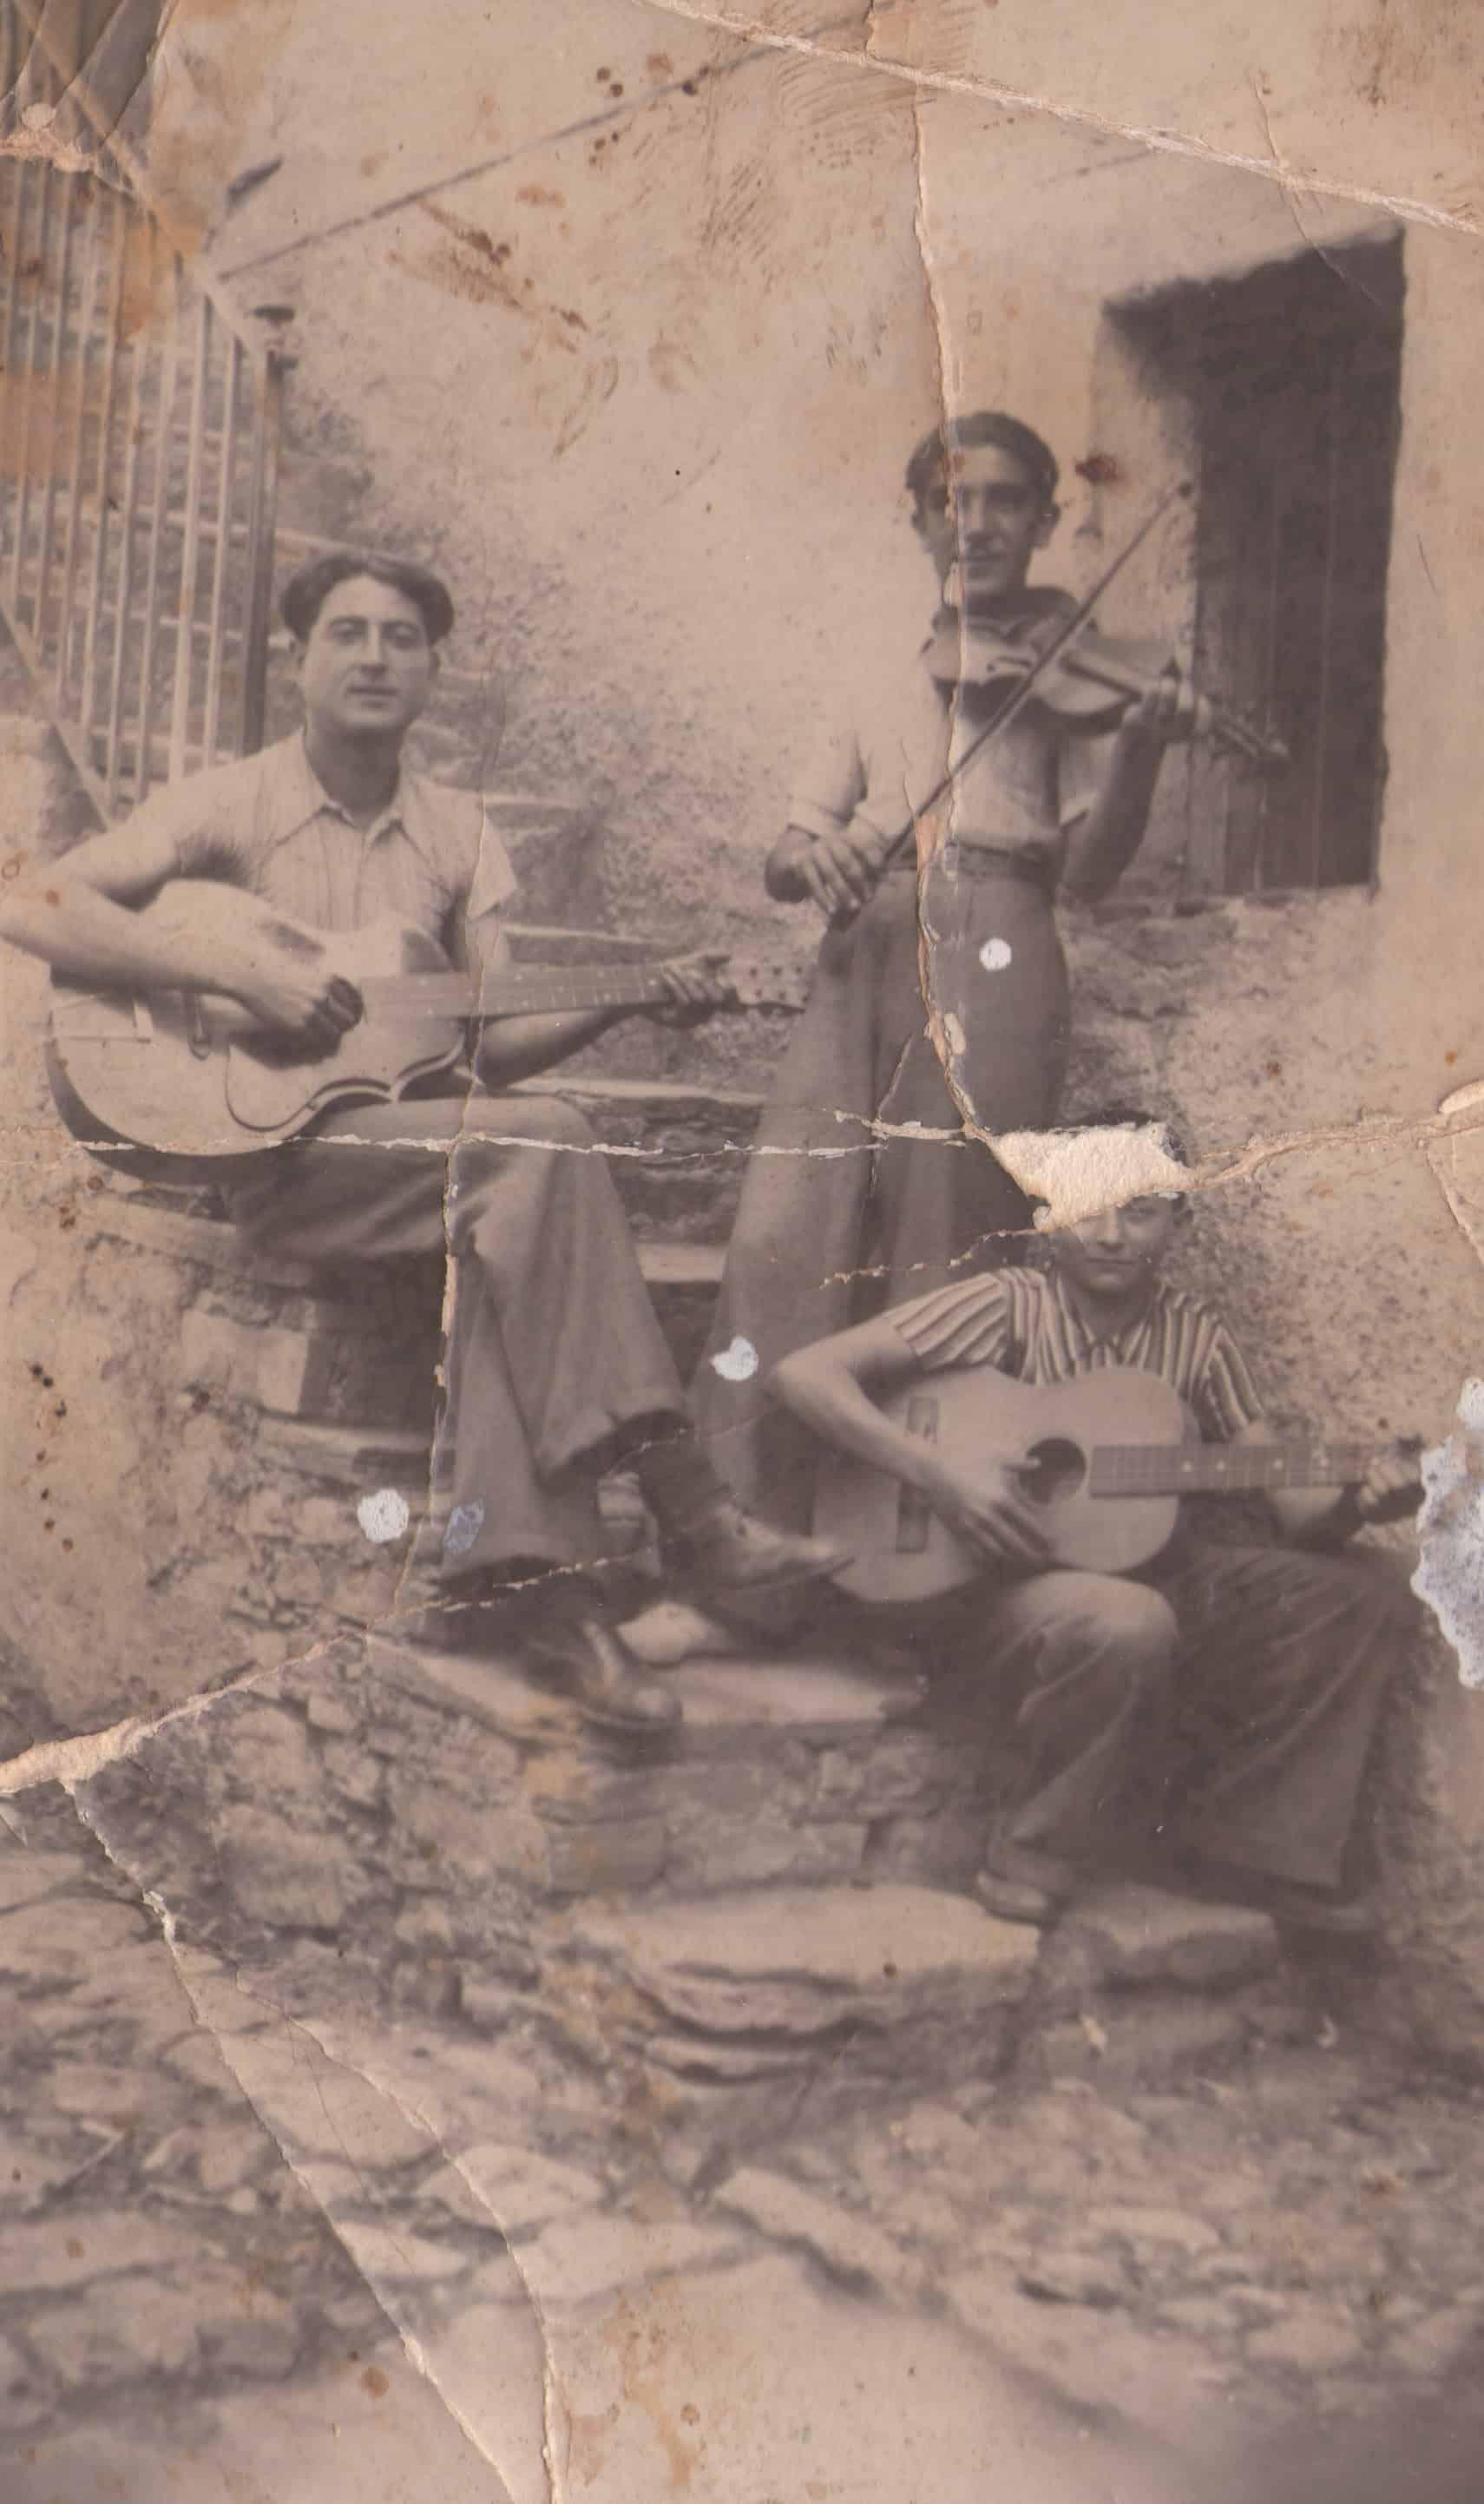 San Costantino 30s